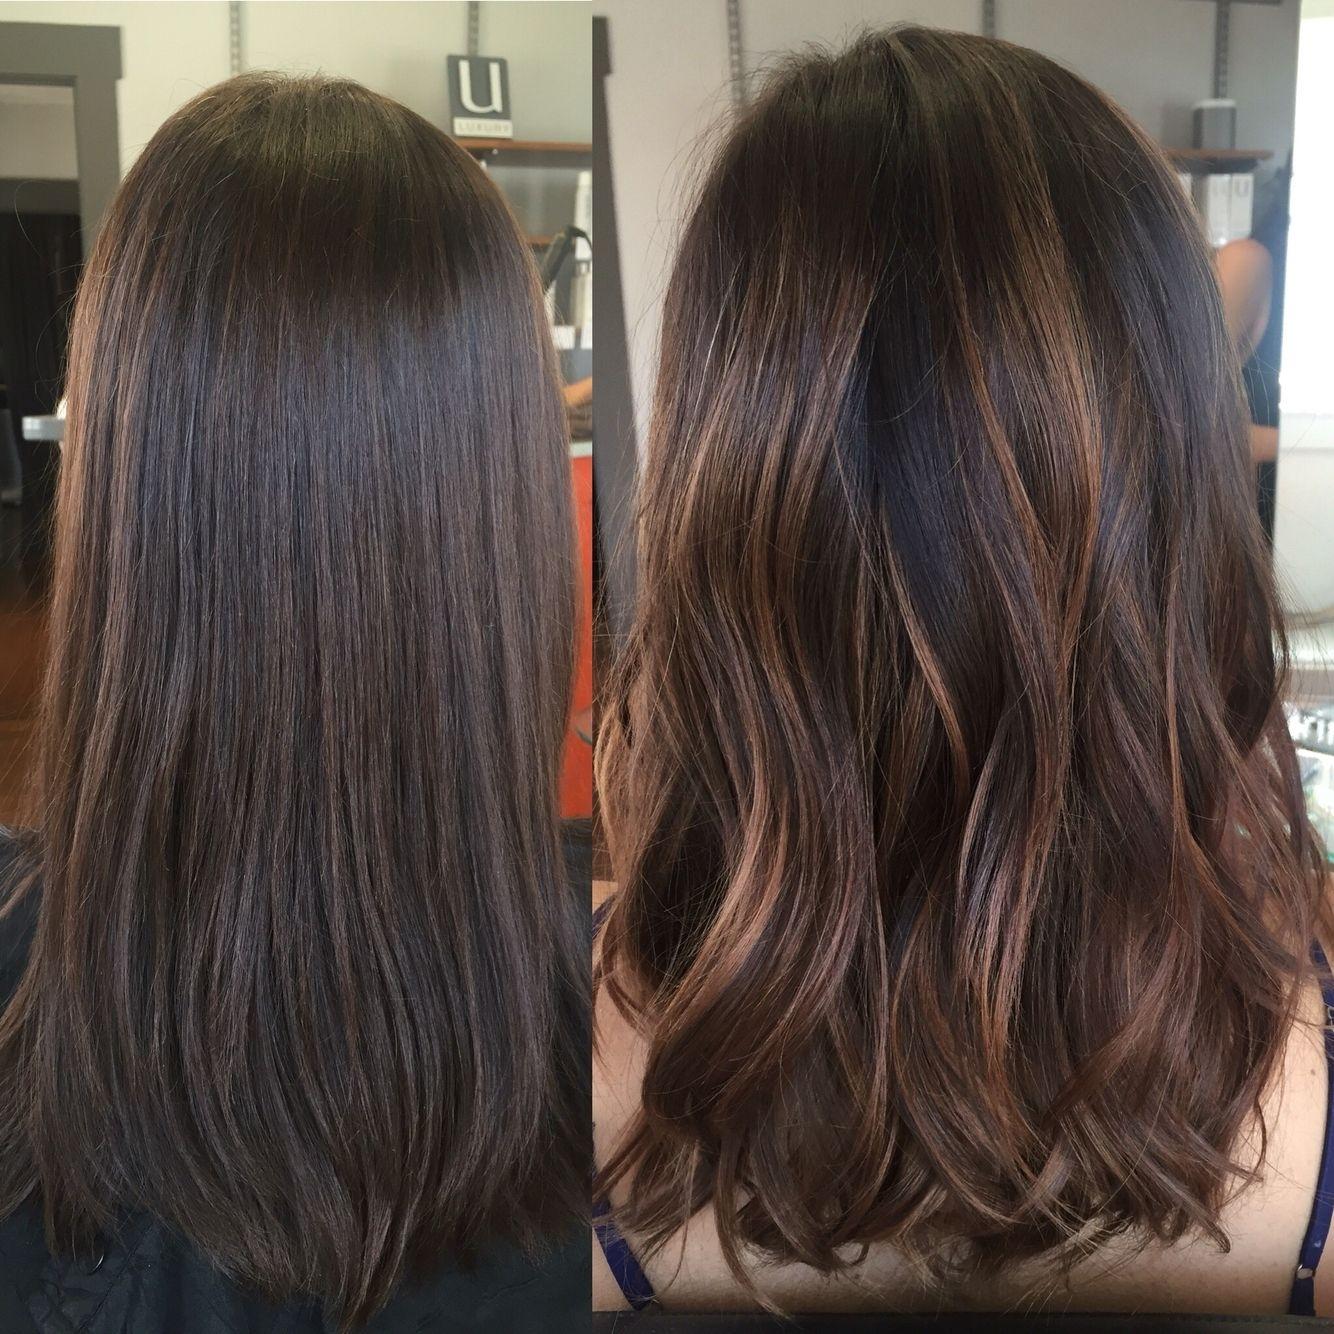 Cinnamon Balayage Highlights! | Rinse Salon. @rinsesalon | Hair in The most ideal Asian Hair With Caramel Highlights